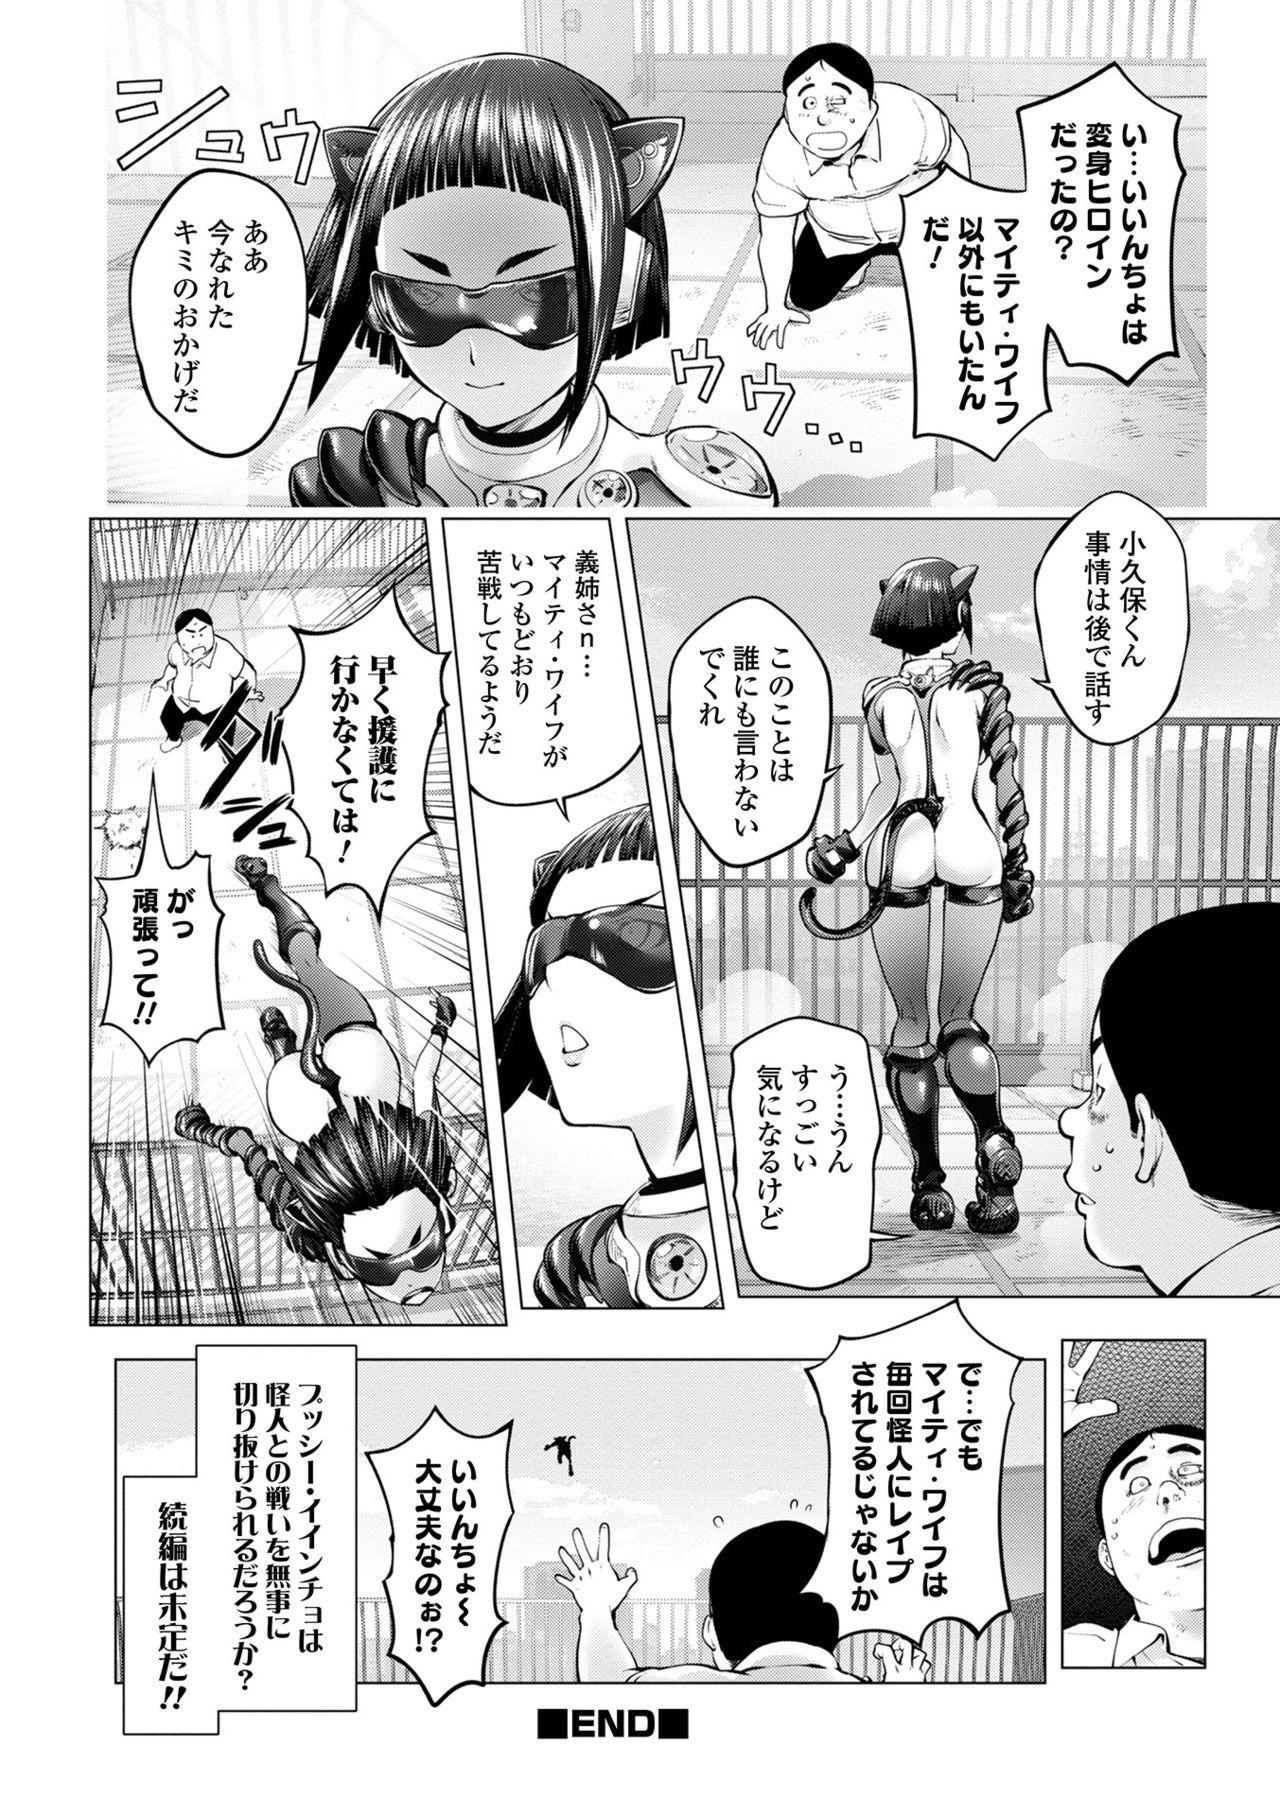 COMIC Shigekiteki SQUIRT!! Vol. 25 85